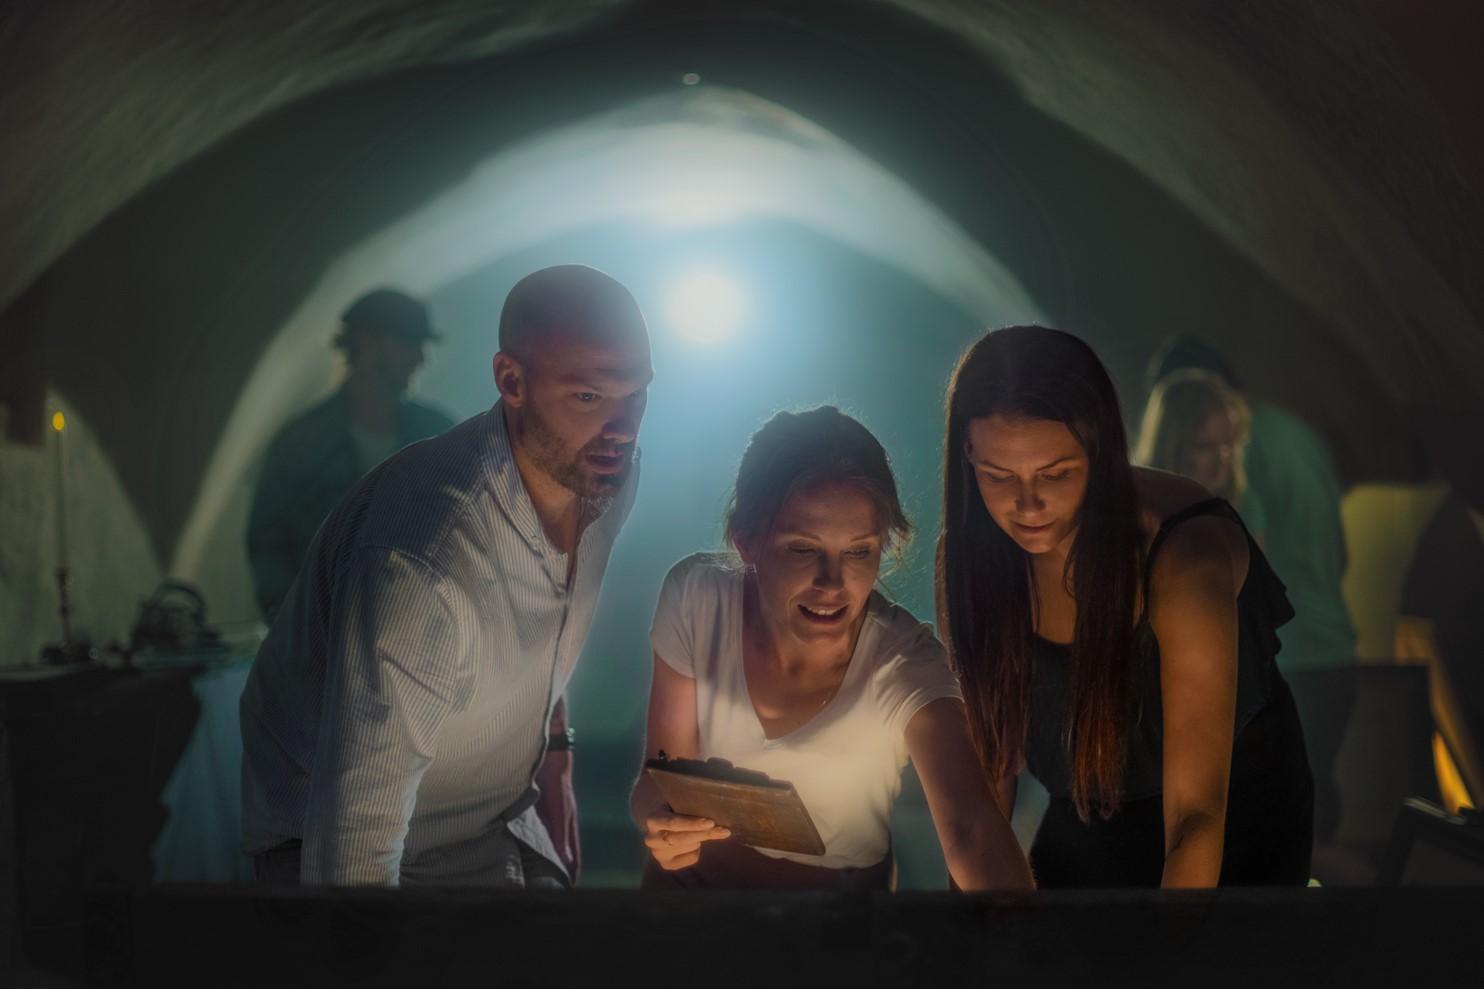 Bjärsjölagårds Slotts Escape Game